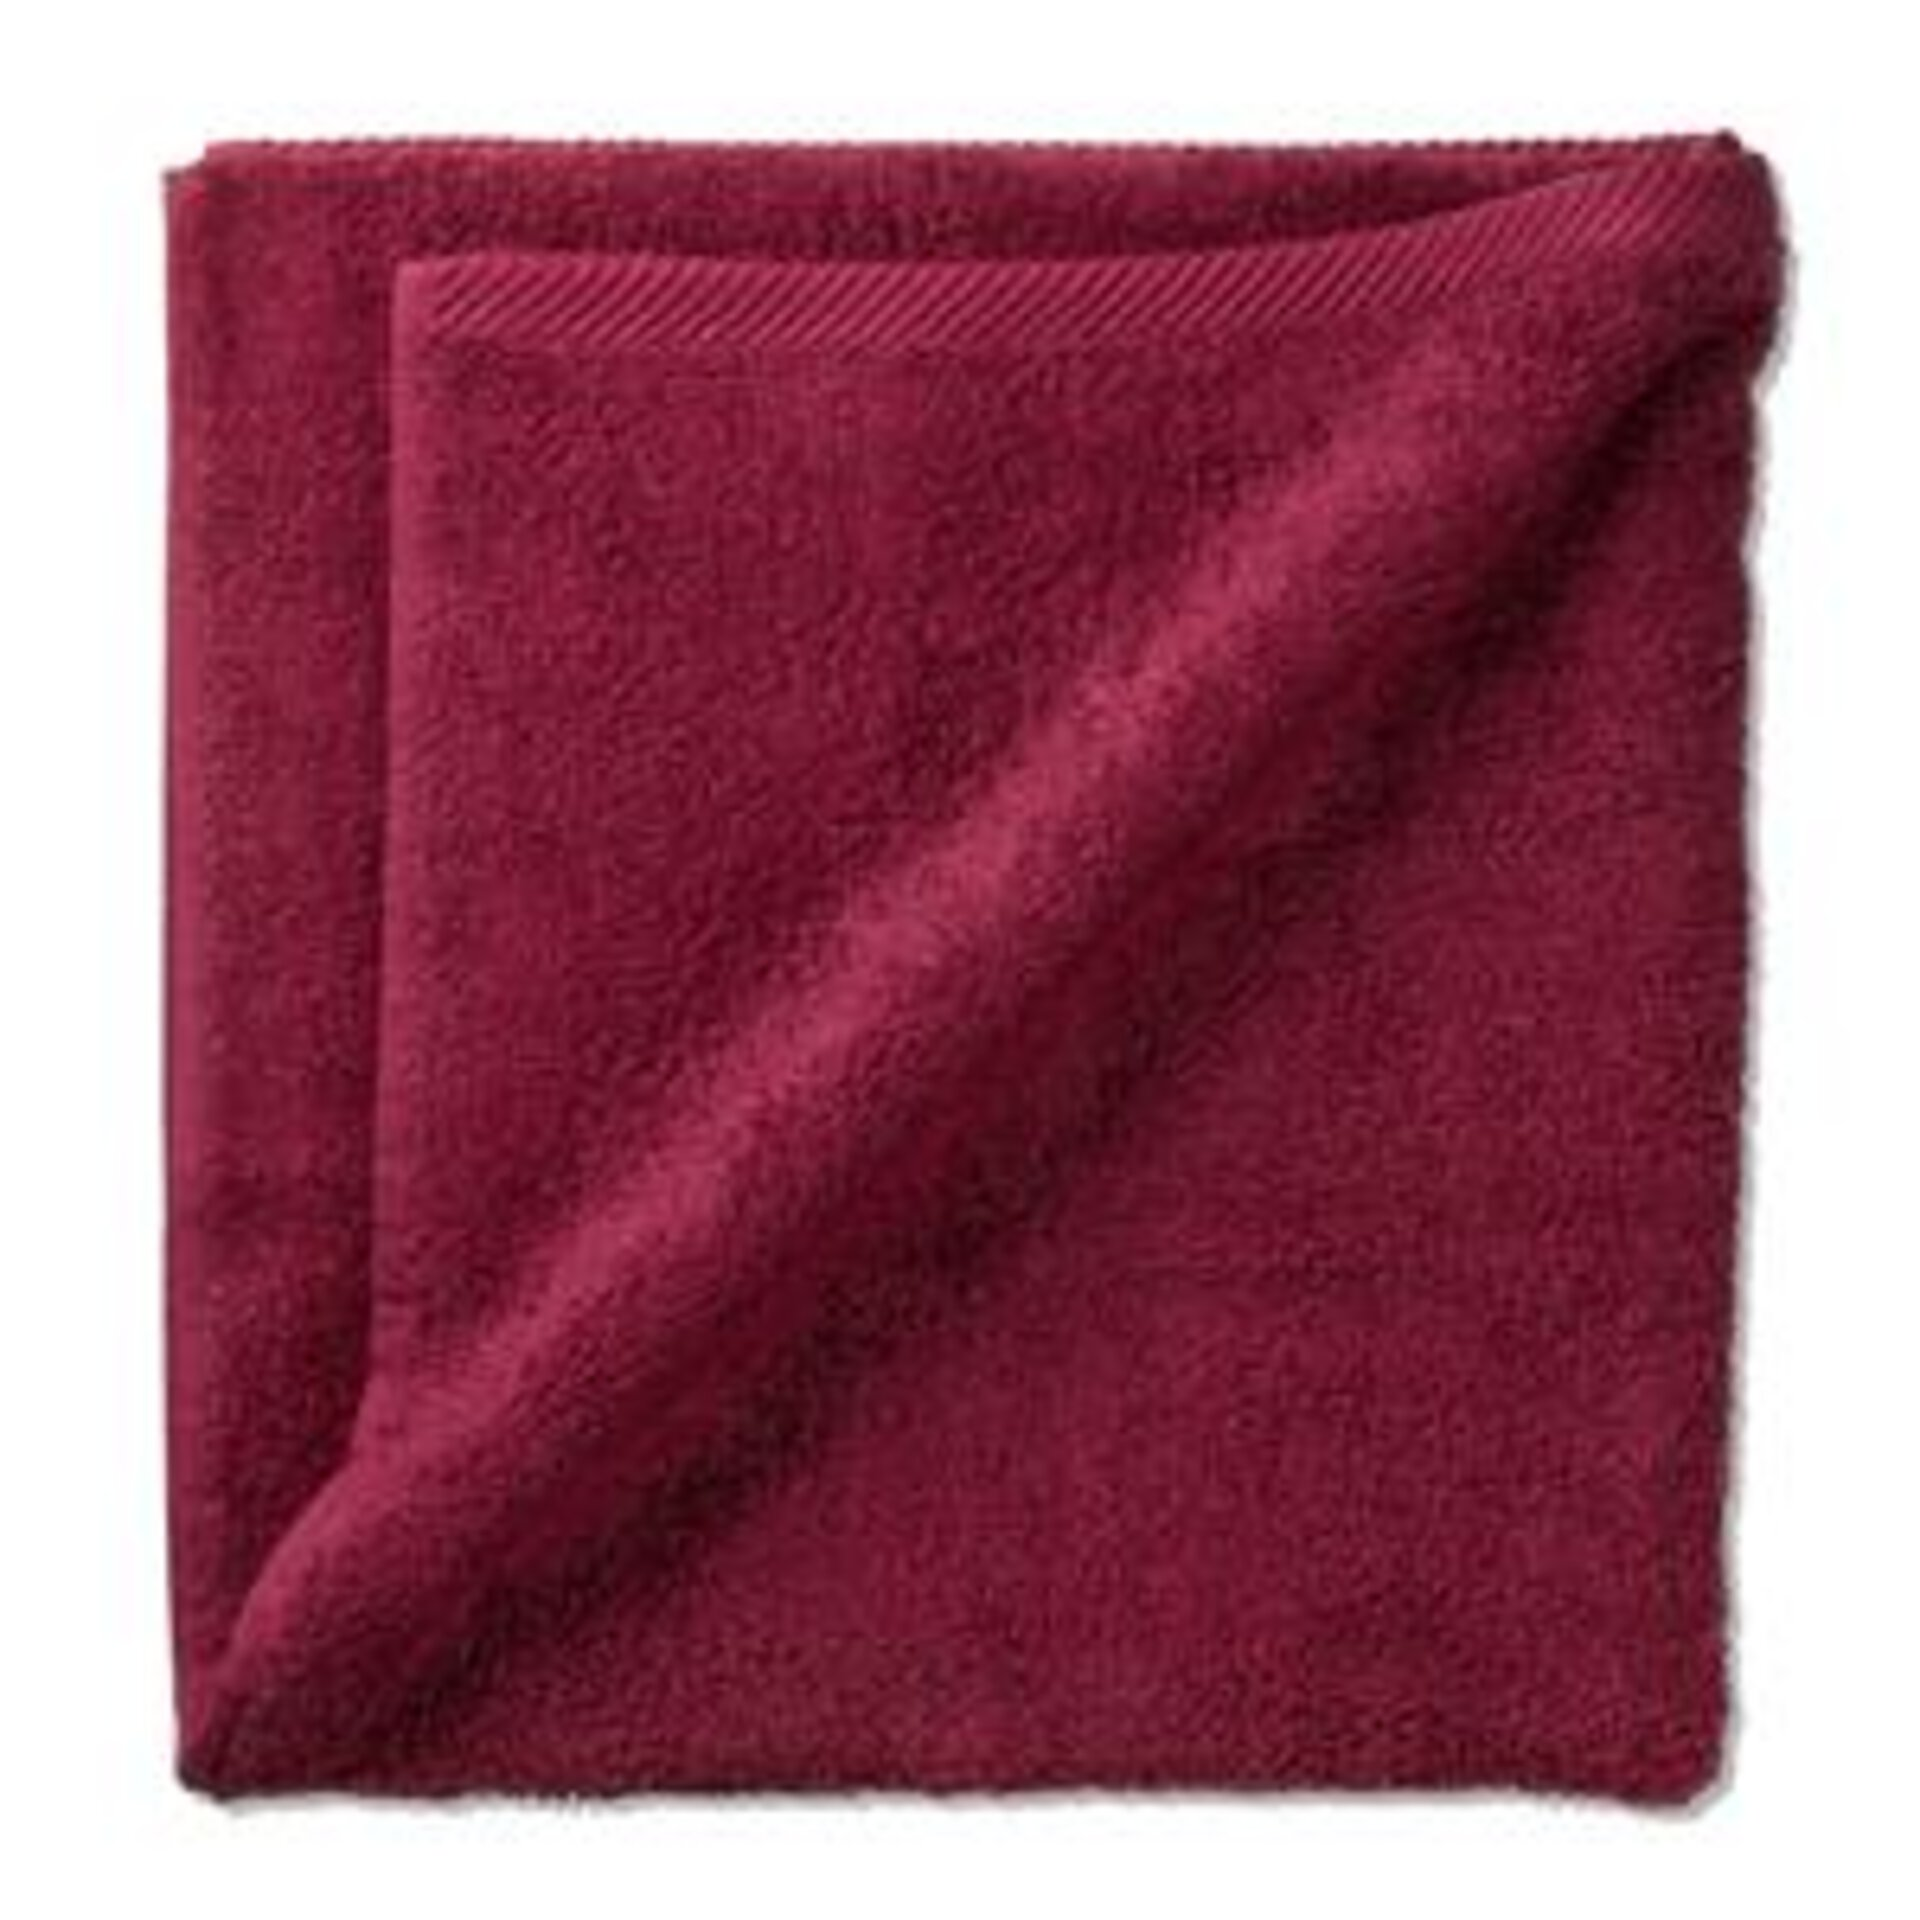 Badetuch Ladessa Kela Textil